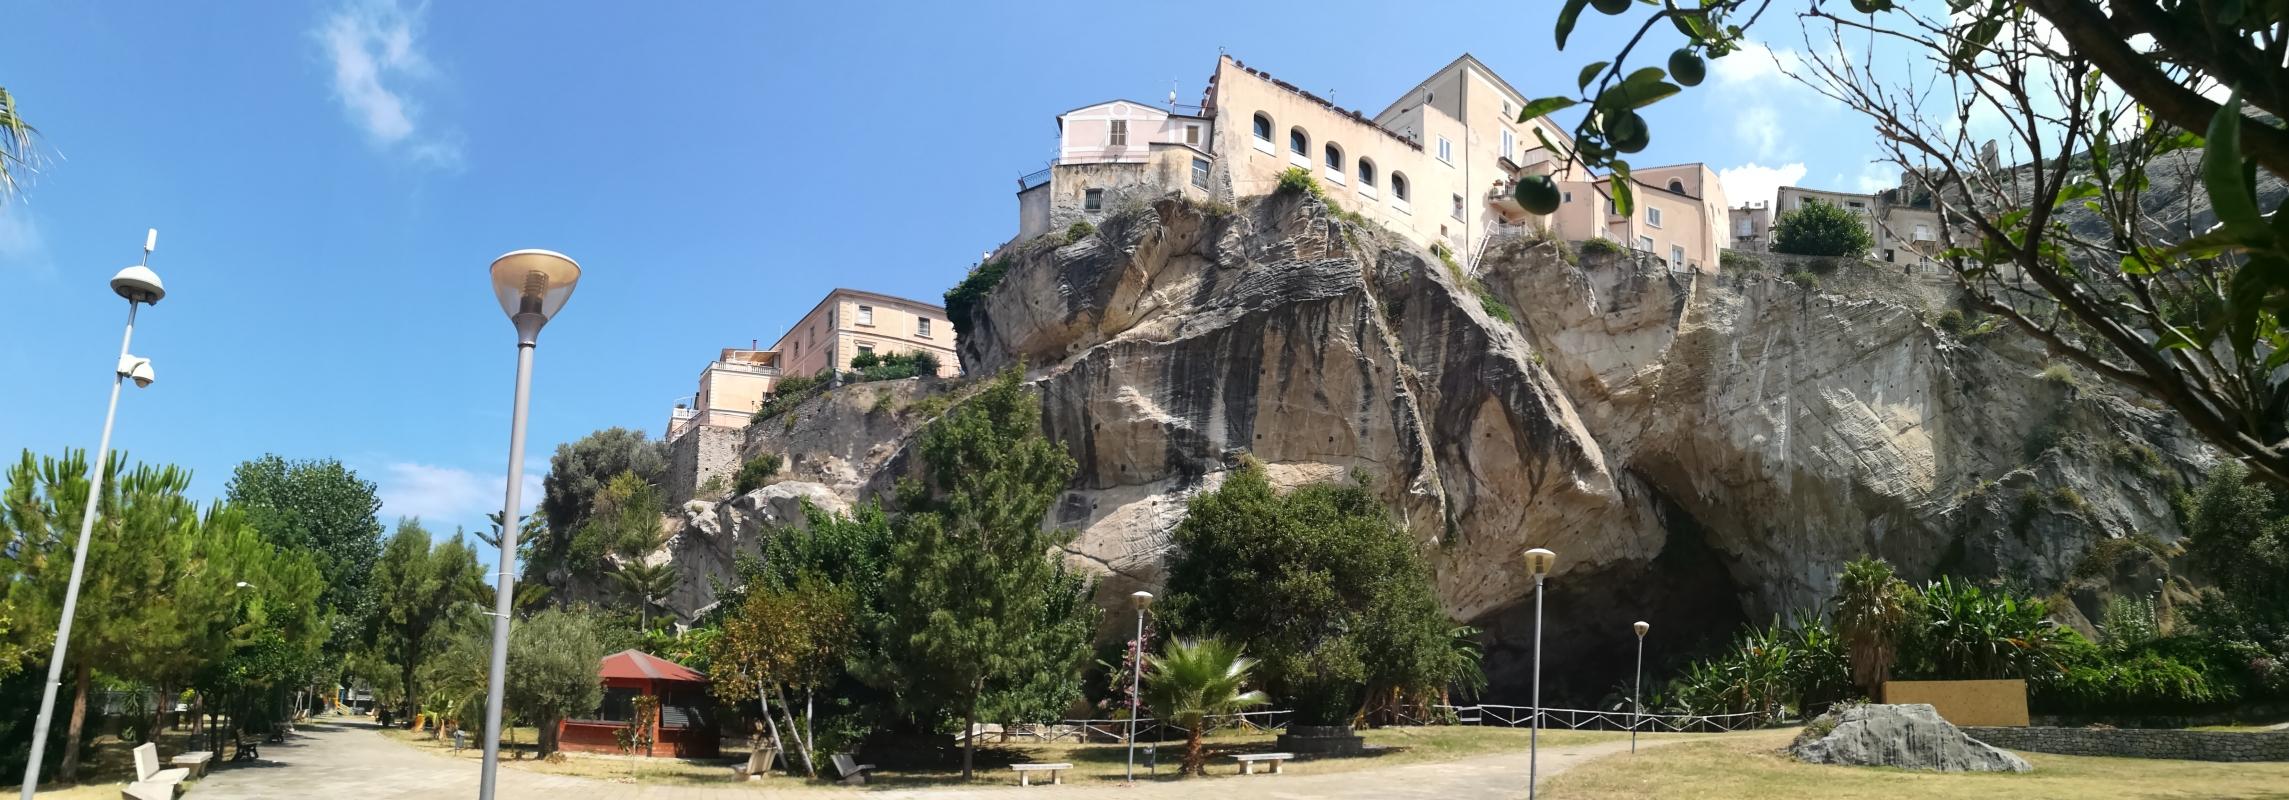 Amantea Parco Grotta Panoramica - Settimioma - Guastalla (RE)